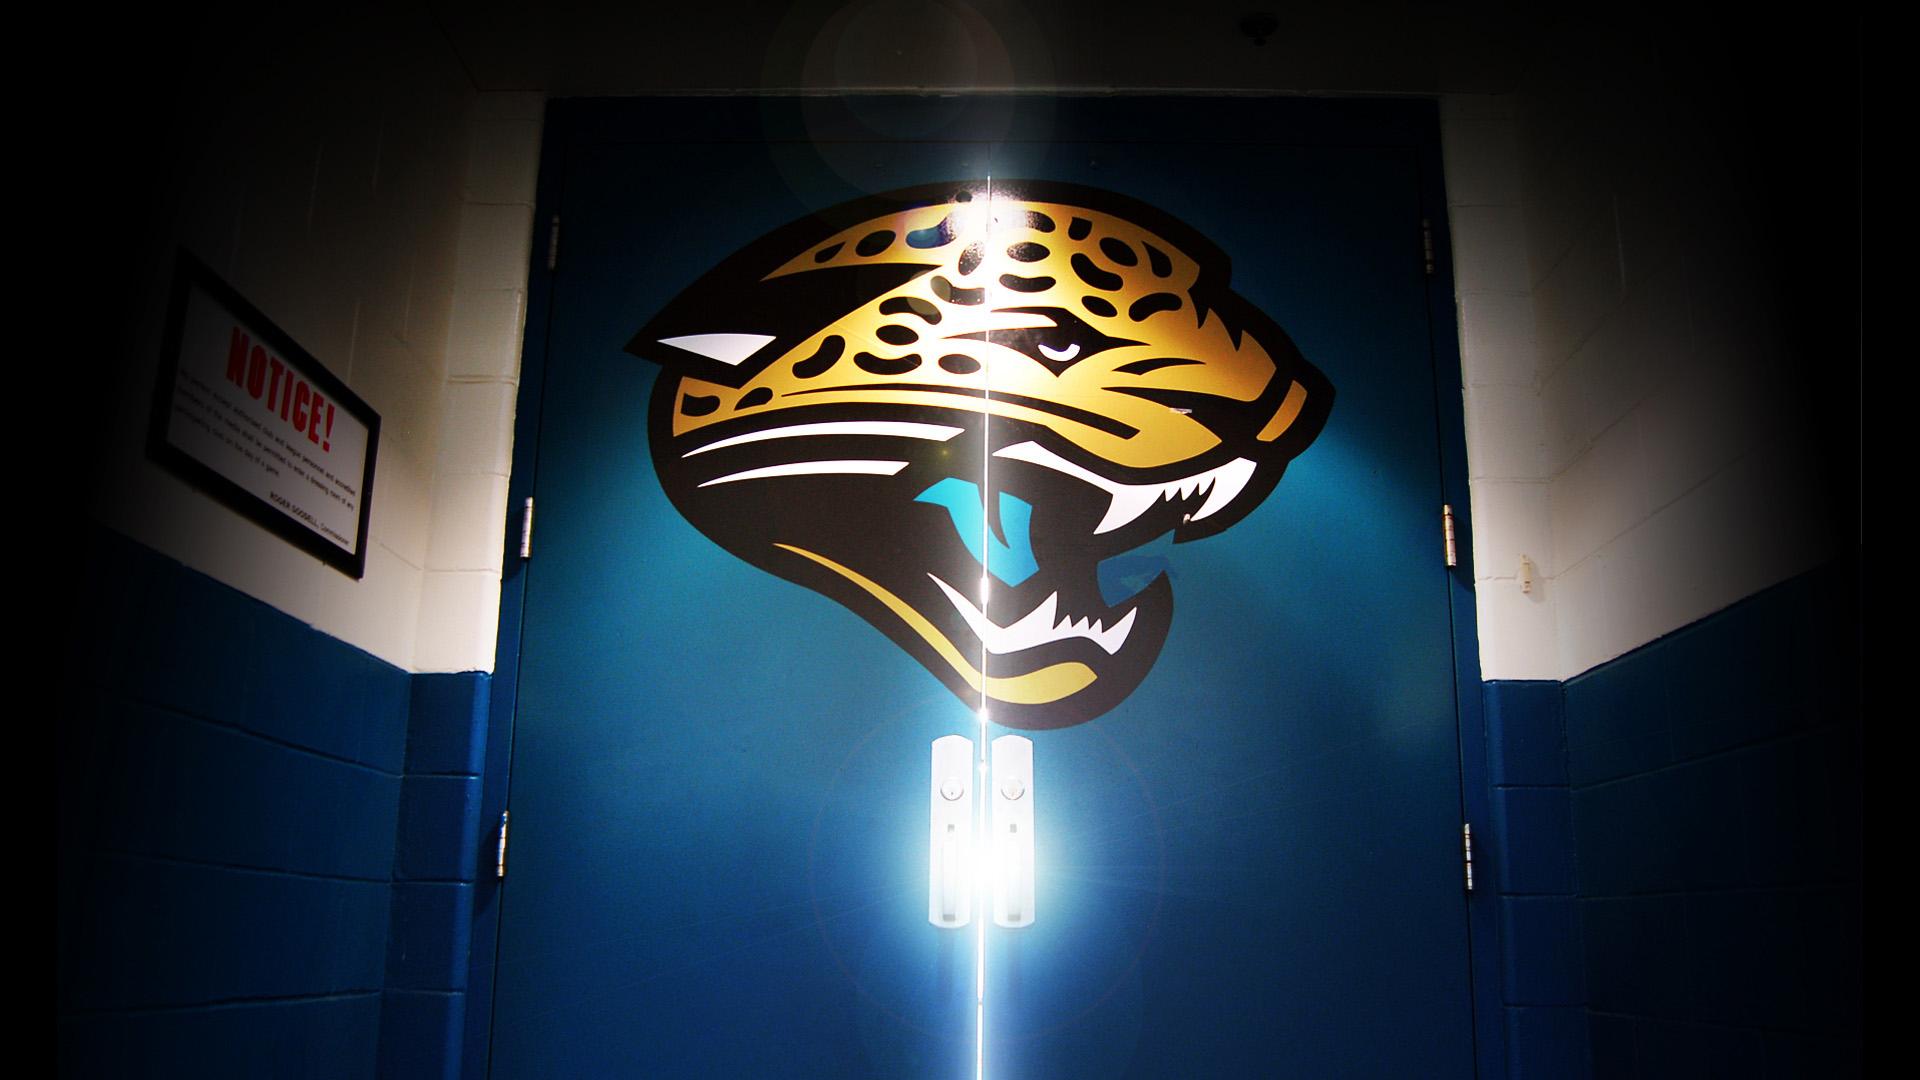 Kitty Wallpaper Iphone Jacksonville Jaguars Locker 1920 215 1080 Digital Citizen